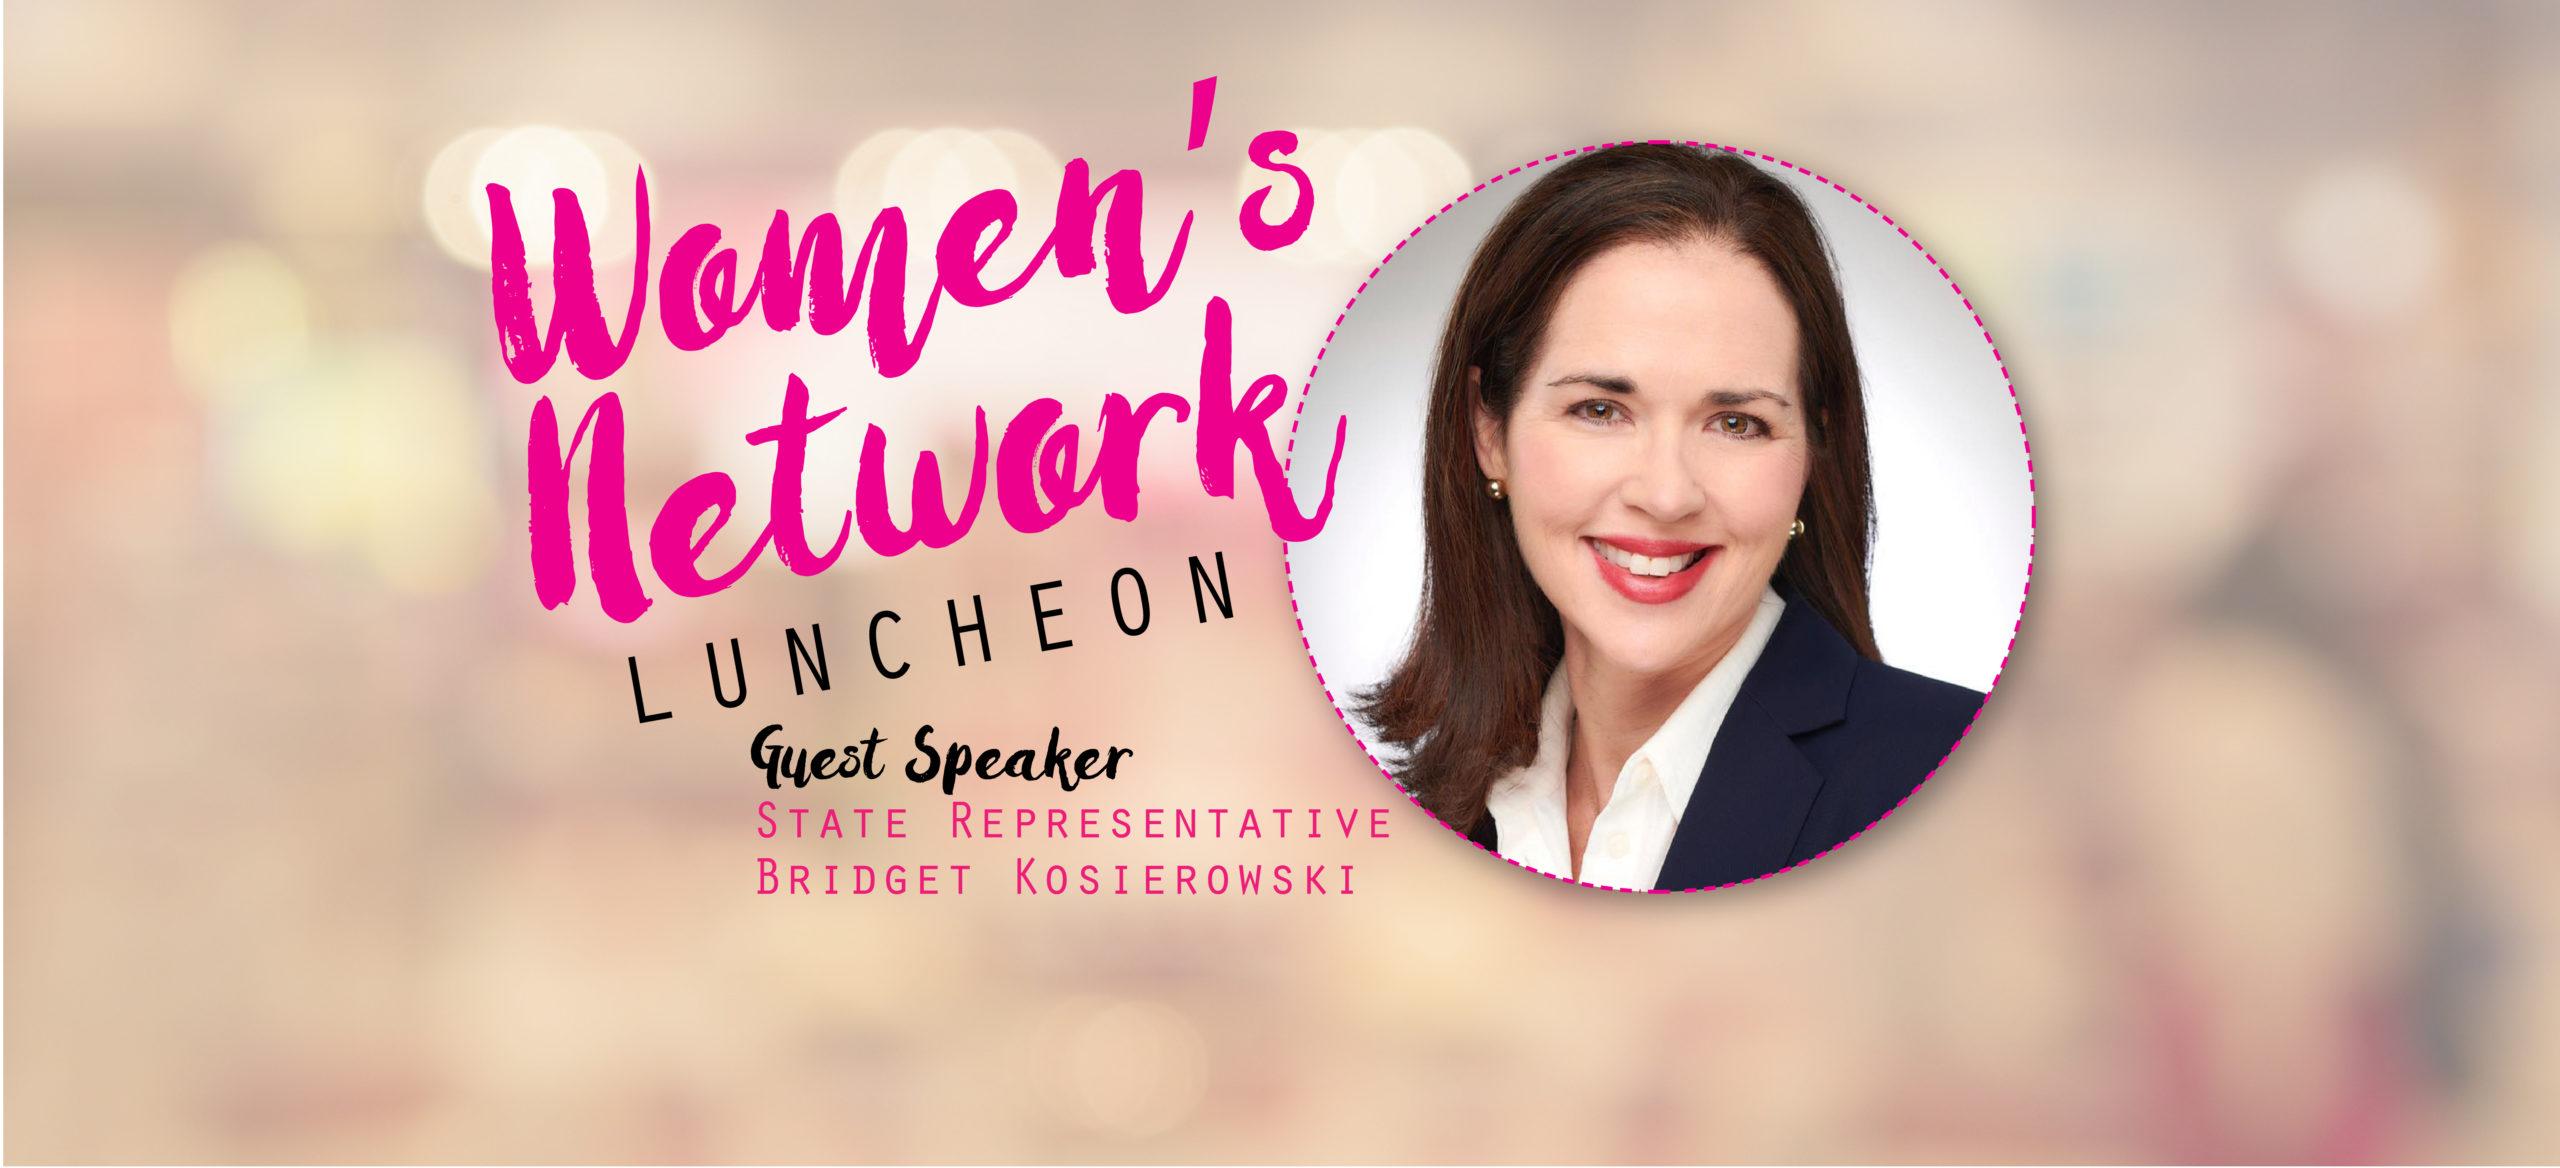 Women's Network Luncheon with State Representative Kosierowski